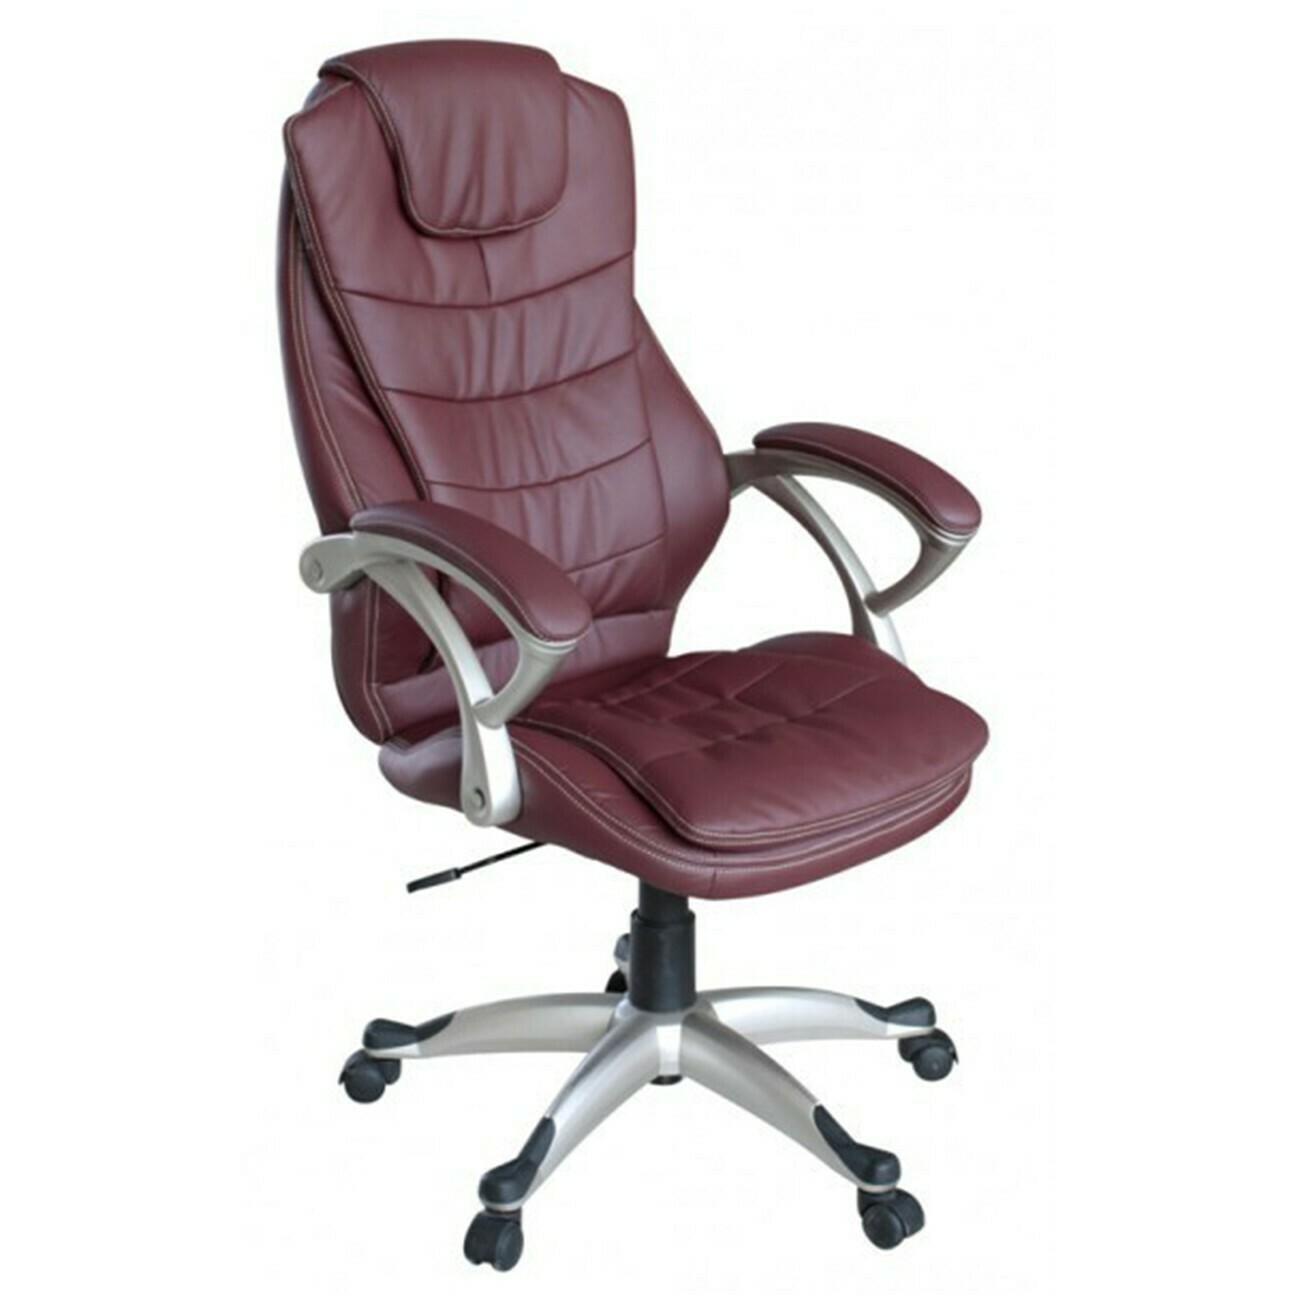 MY SIT Bürostuhl Chefsessel Chicago aus Kunstleder Deluxe Edition in Burgunder